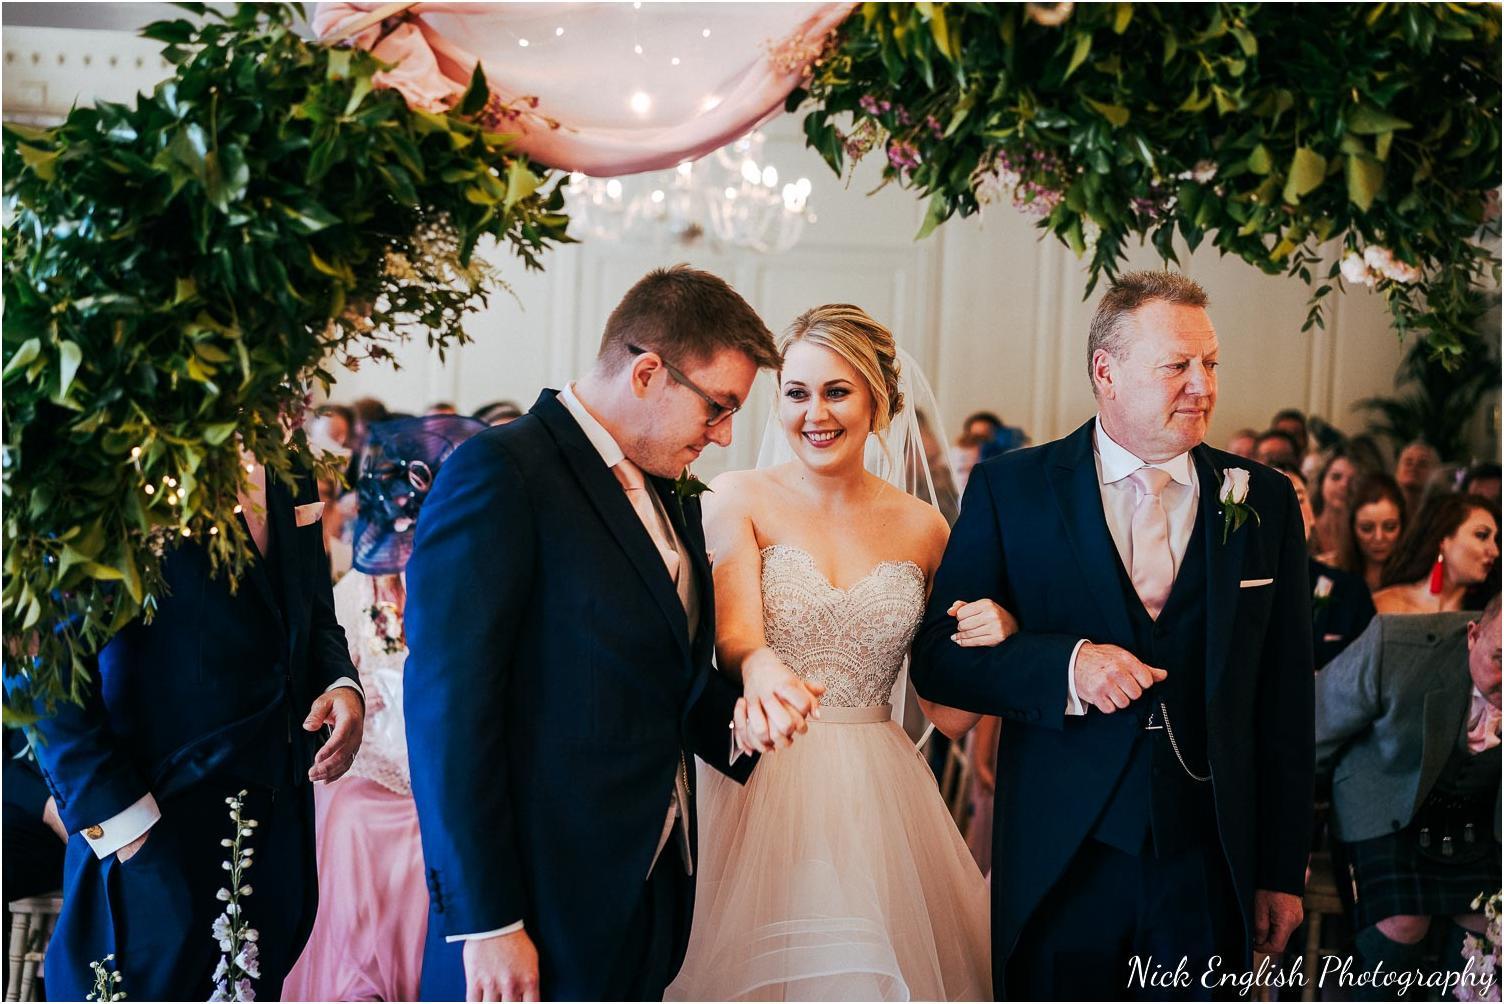 Eaves_Hall_Wedding_Photographer-36.jpg